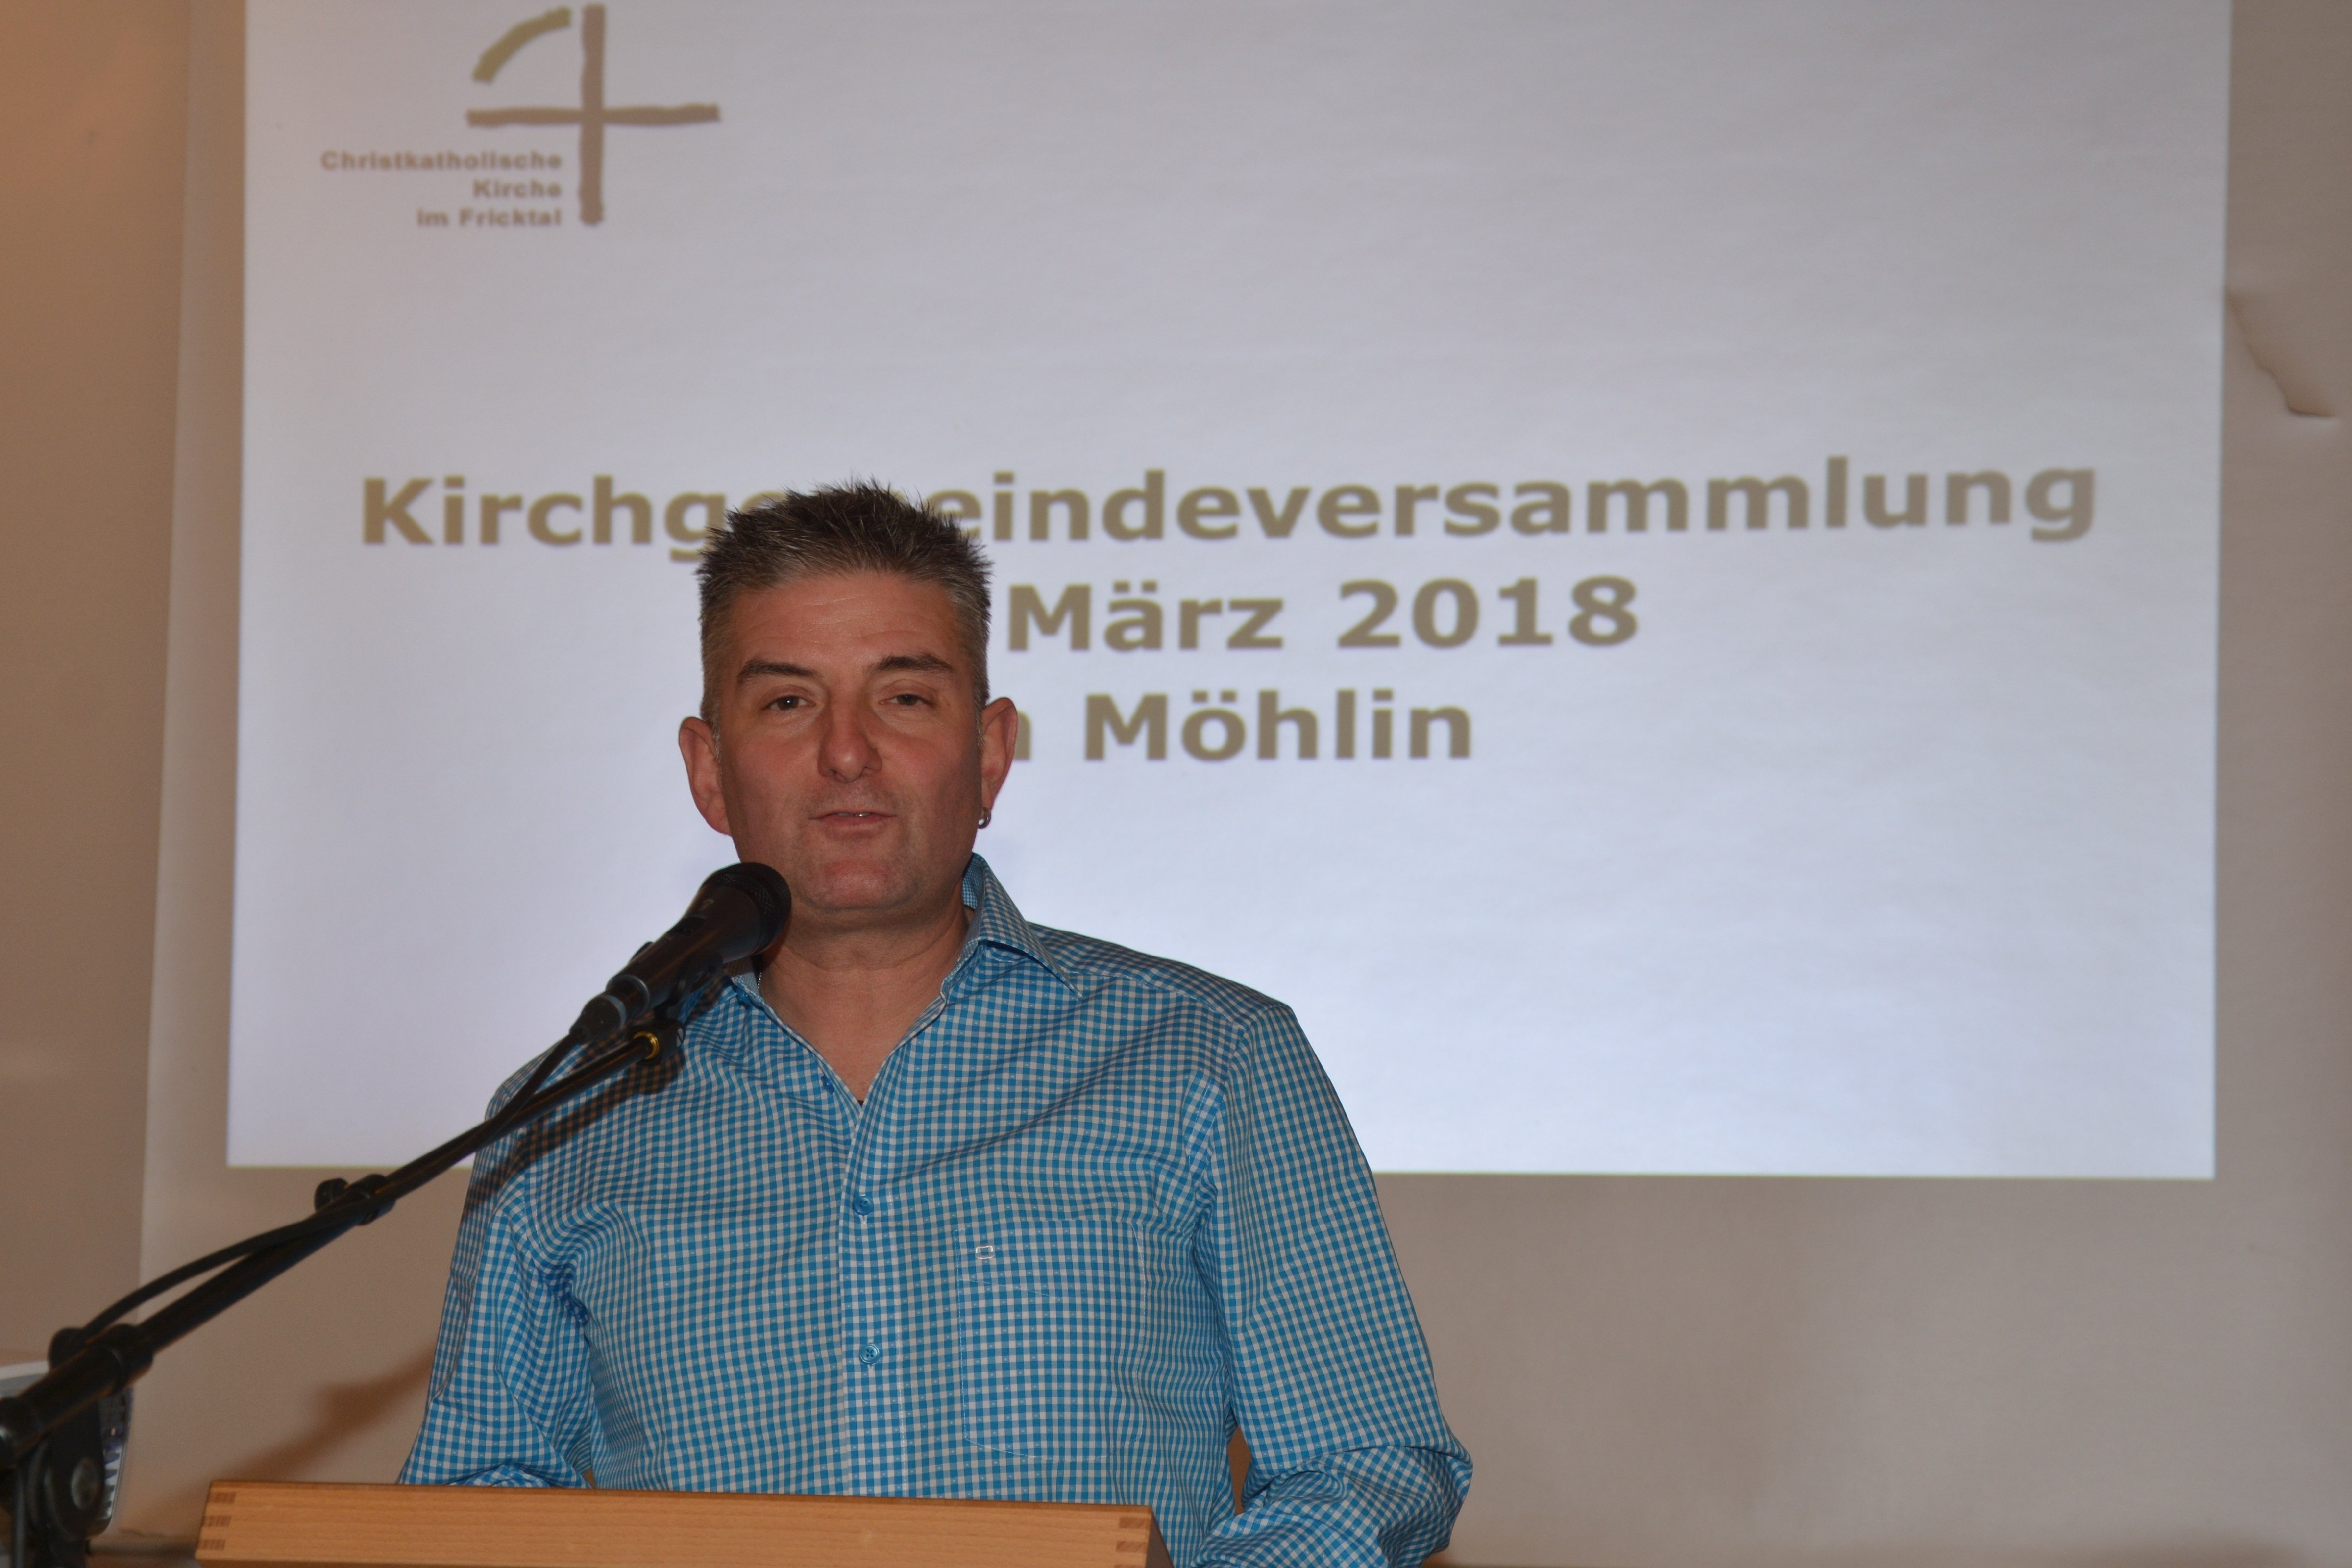 Kirchgemeindeversammlung 2018